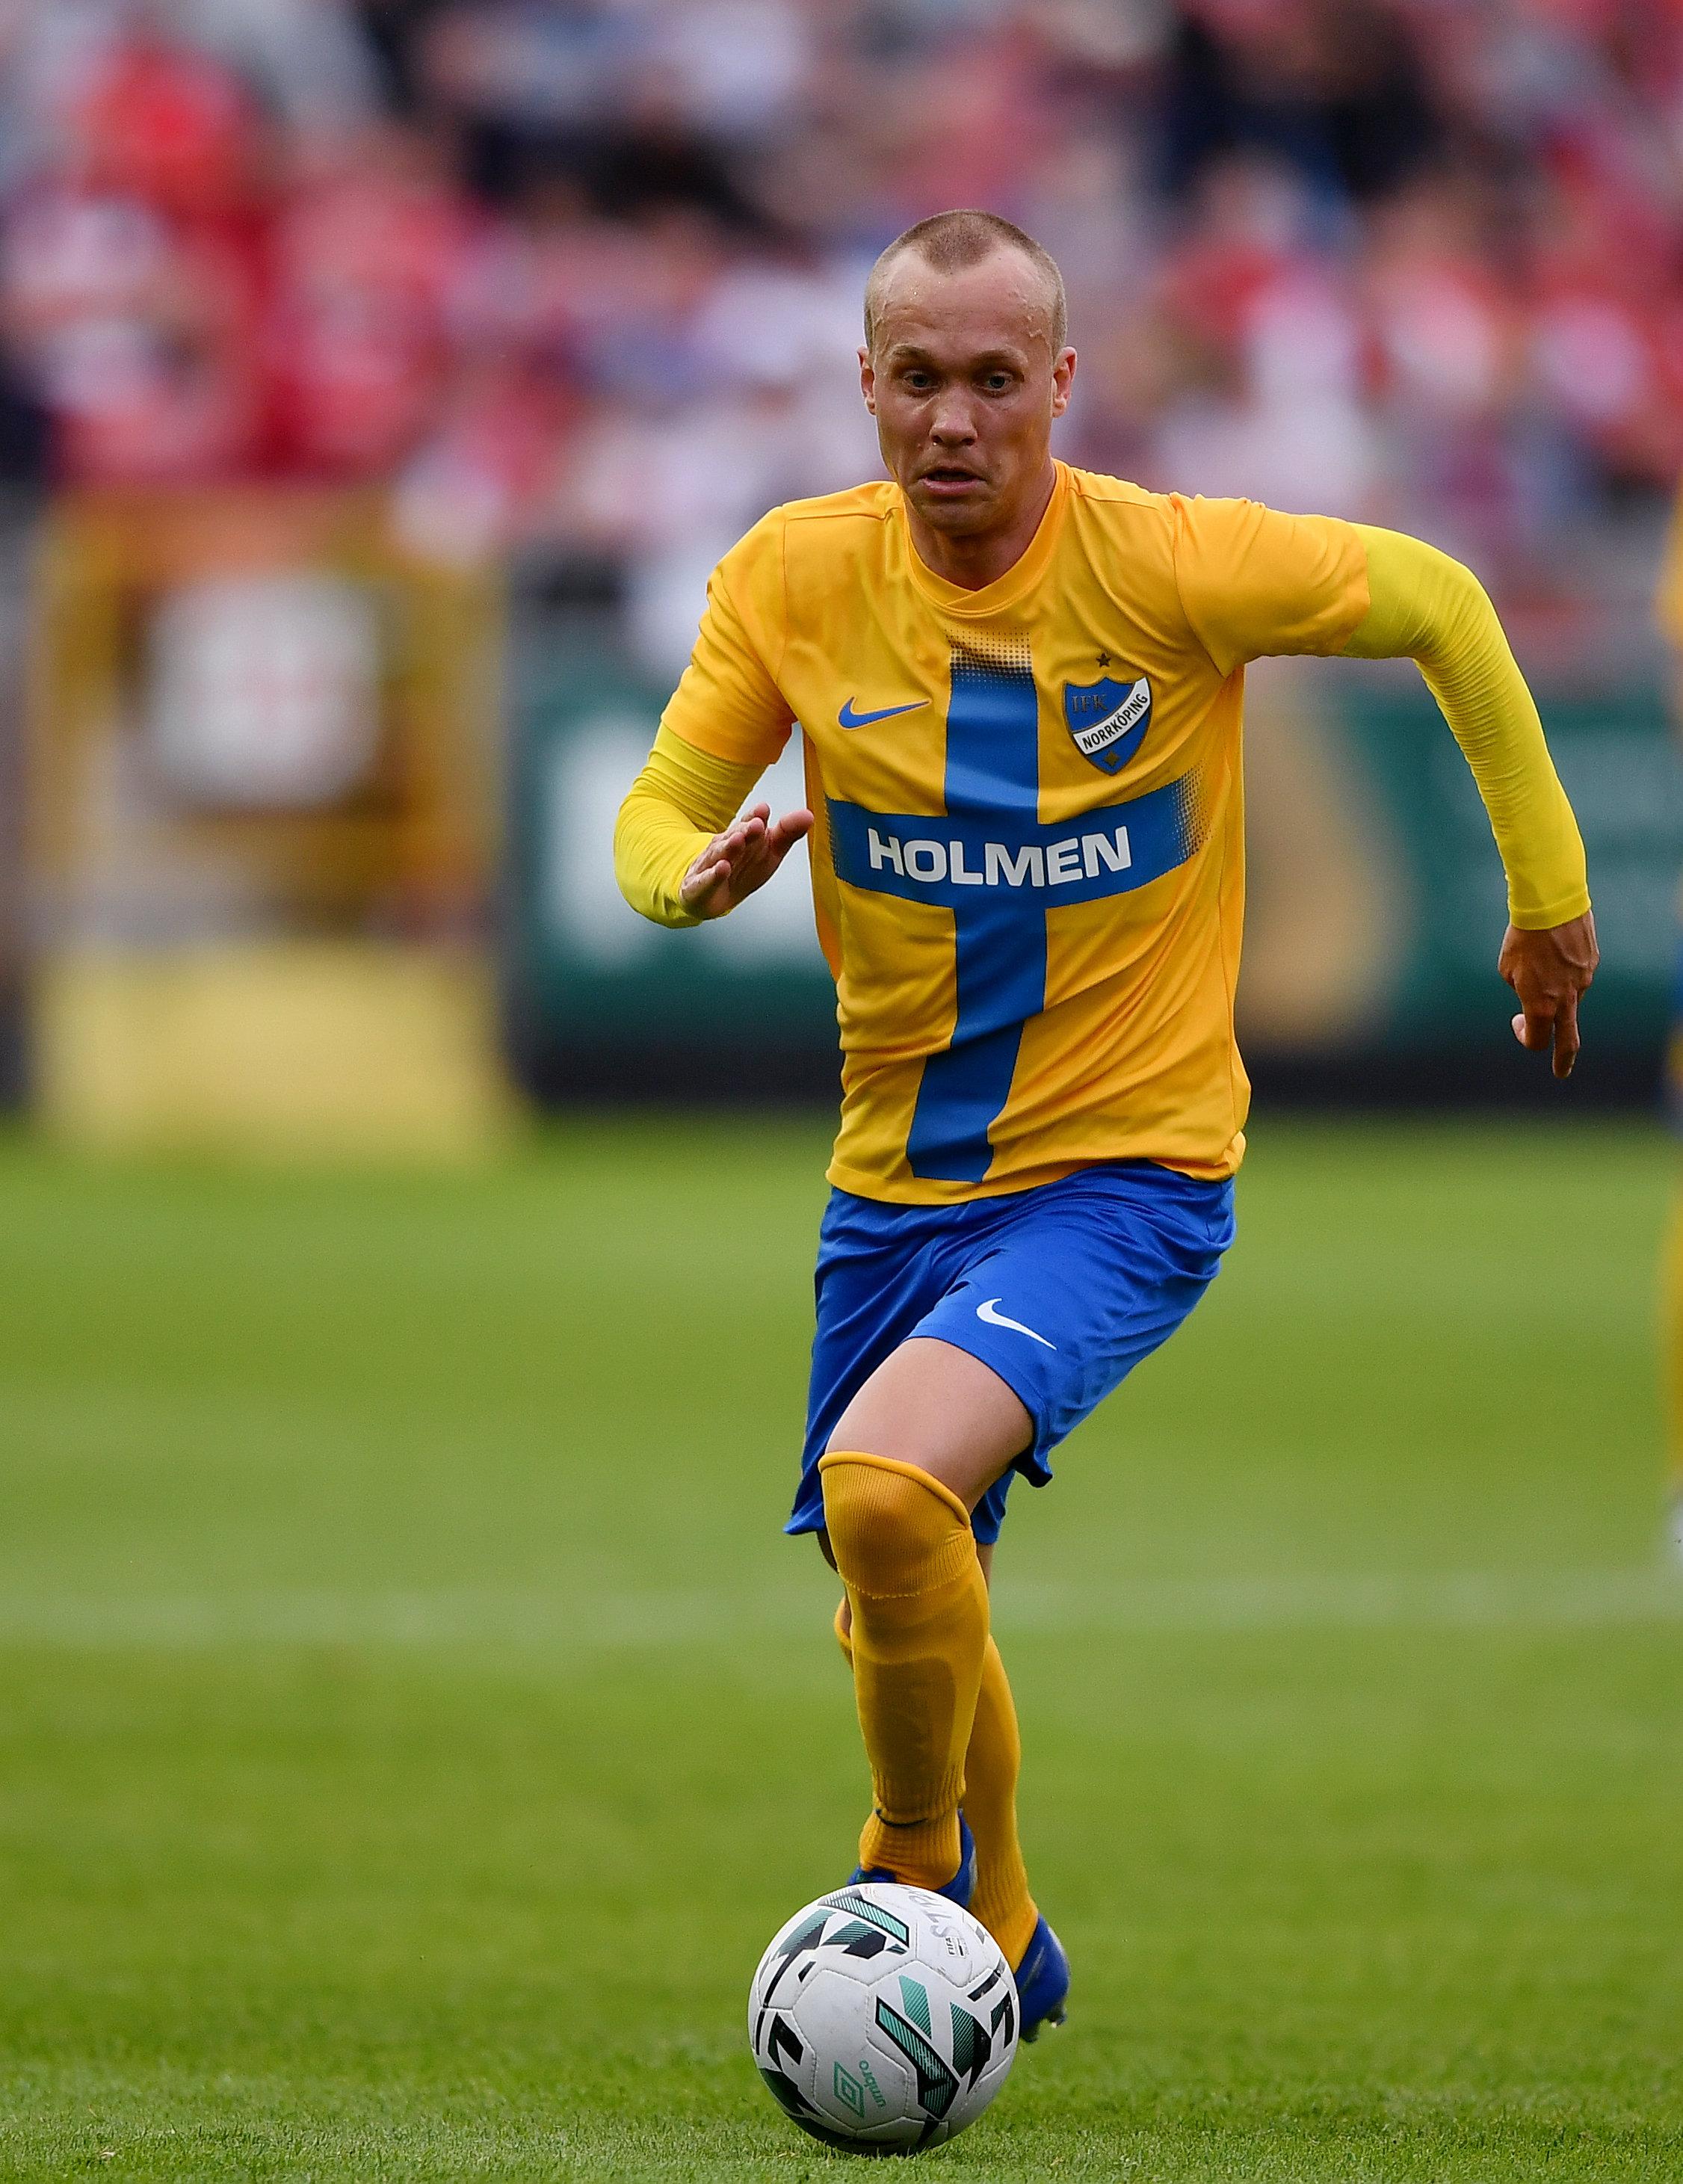 St Patrick's Athletic v IFK Norrköping - UEFA Europa League First Qualifying Round 1st Leg